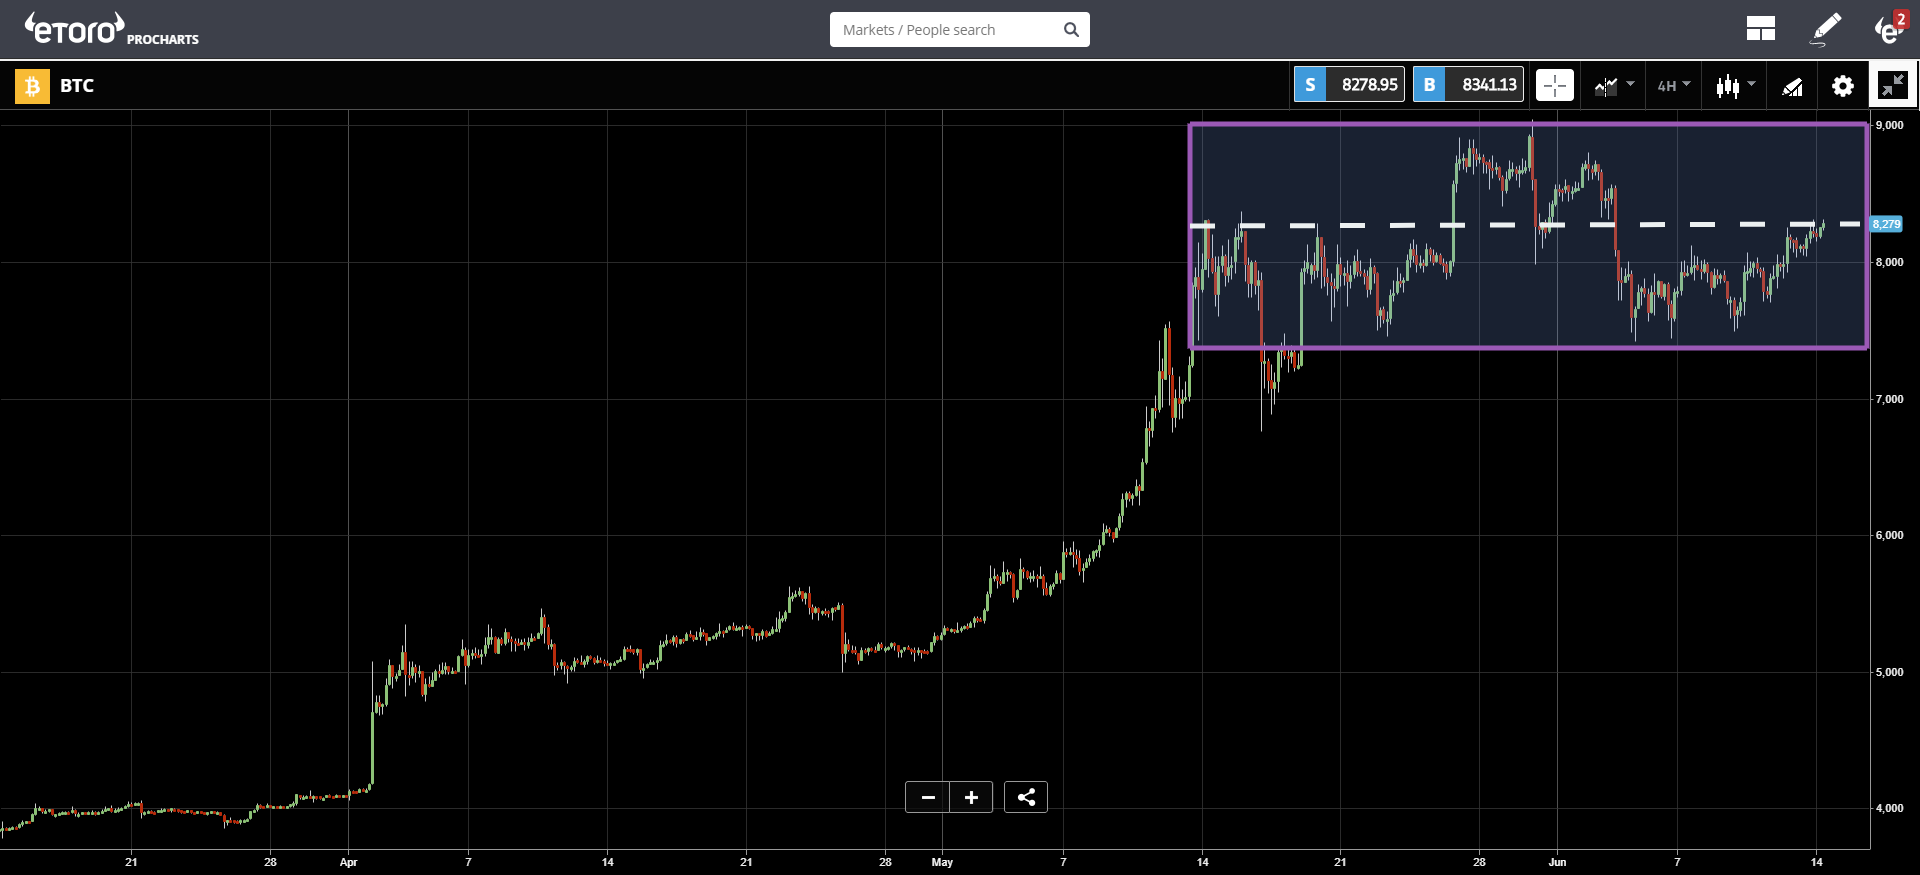 crypto, market, US, bitcoin, blockchain, trading, ethereum, binance